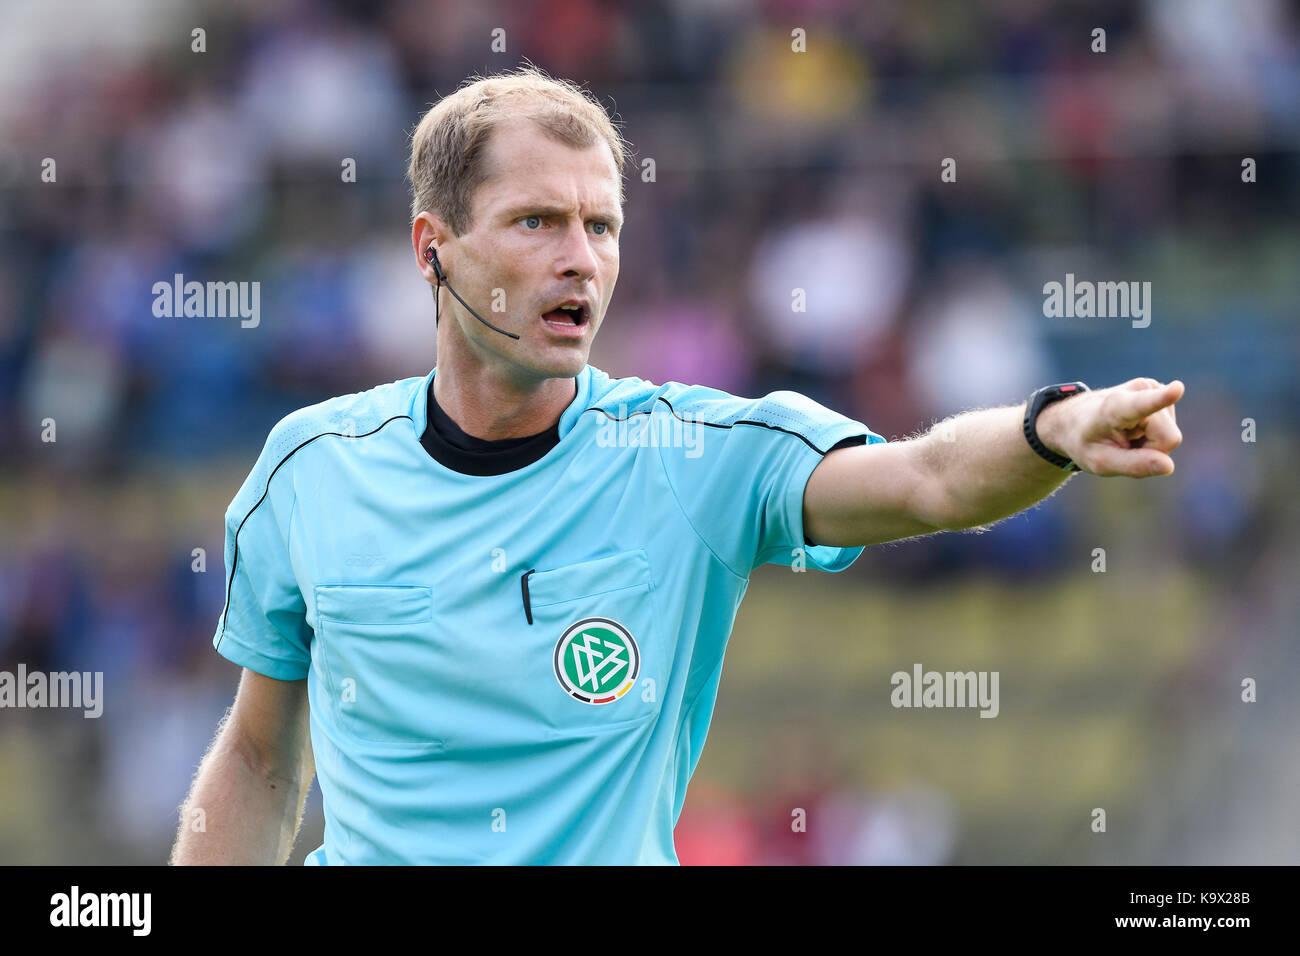 Karlsruhe, Deutschland. 24th Sep, 2017. Schiedsrichter Rene Rohde. GES/ Fussball/ 3. Liga: Karlsruher SC - FC Rot - Stock Image